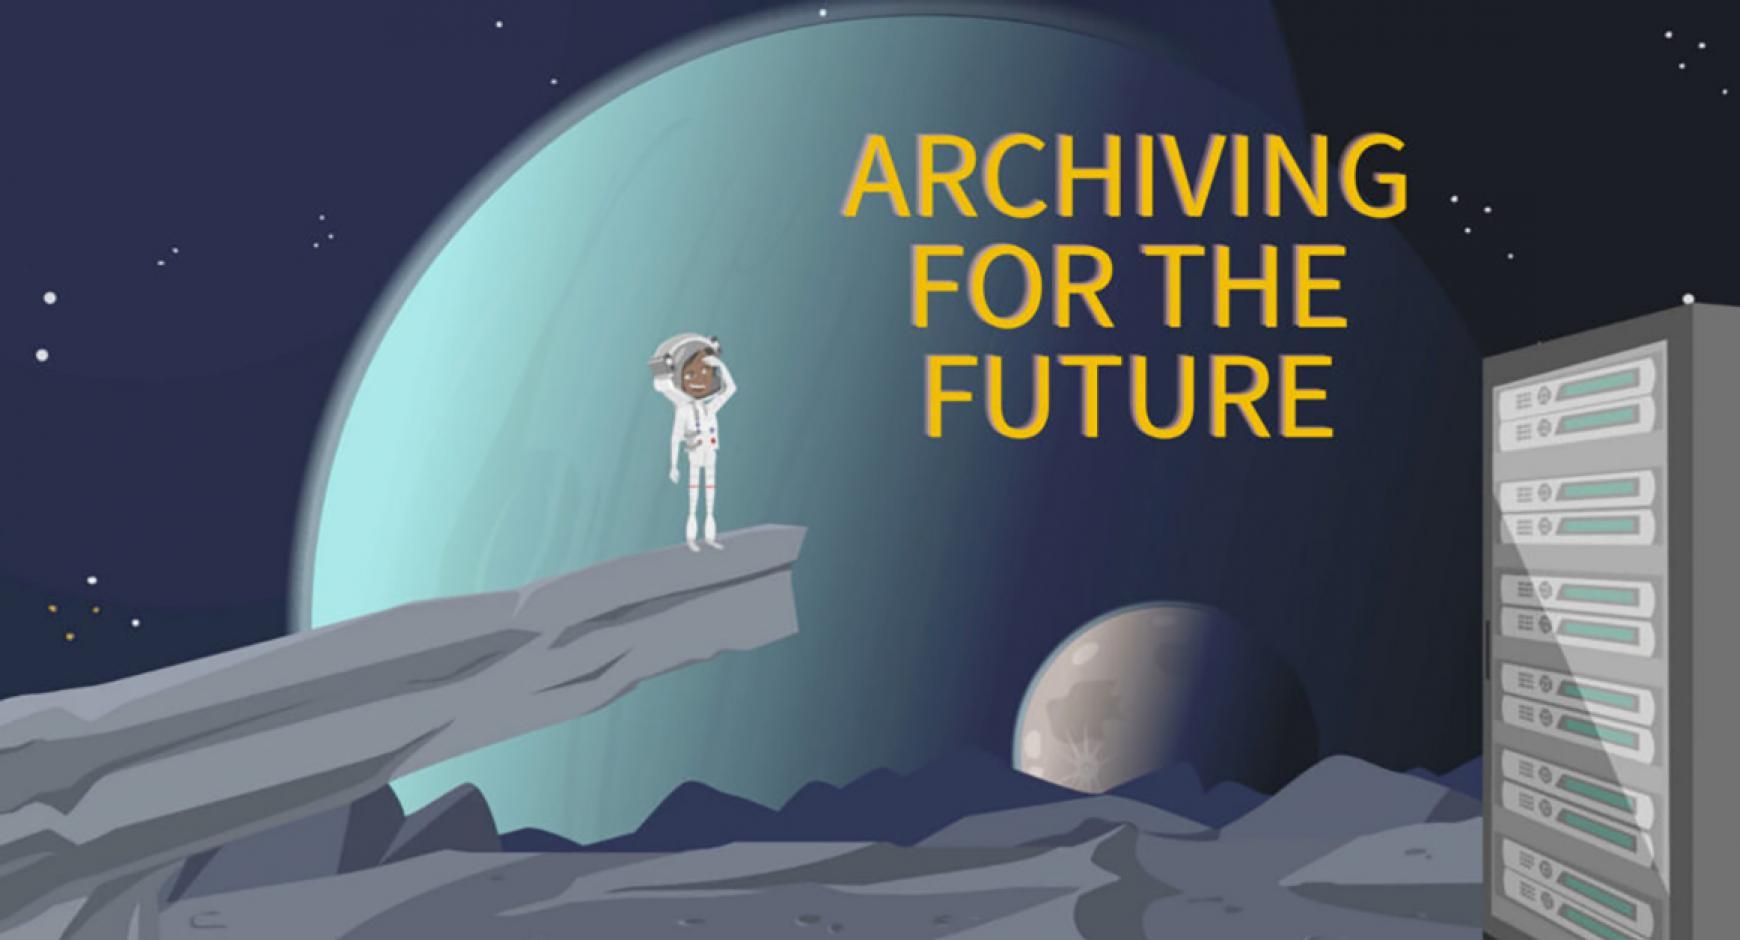 cartoon illustration of astronaut on lunar landscape looking at server